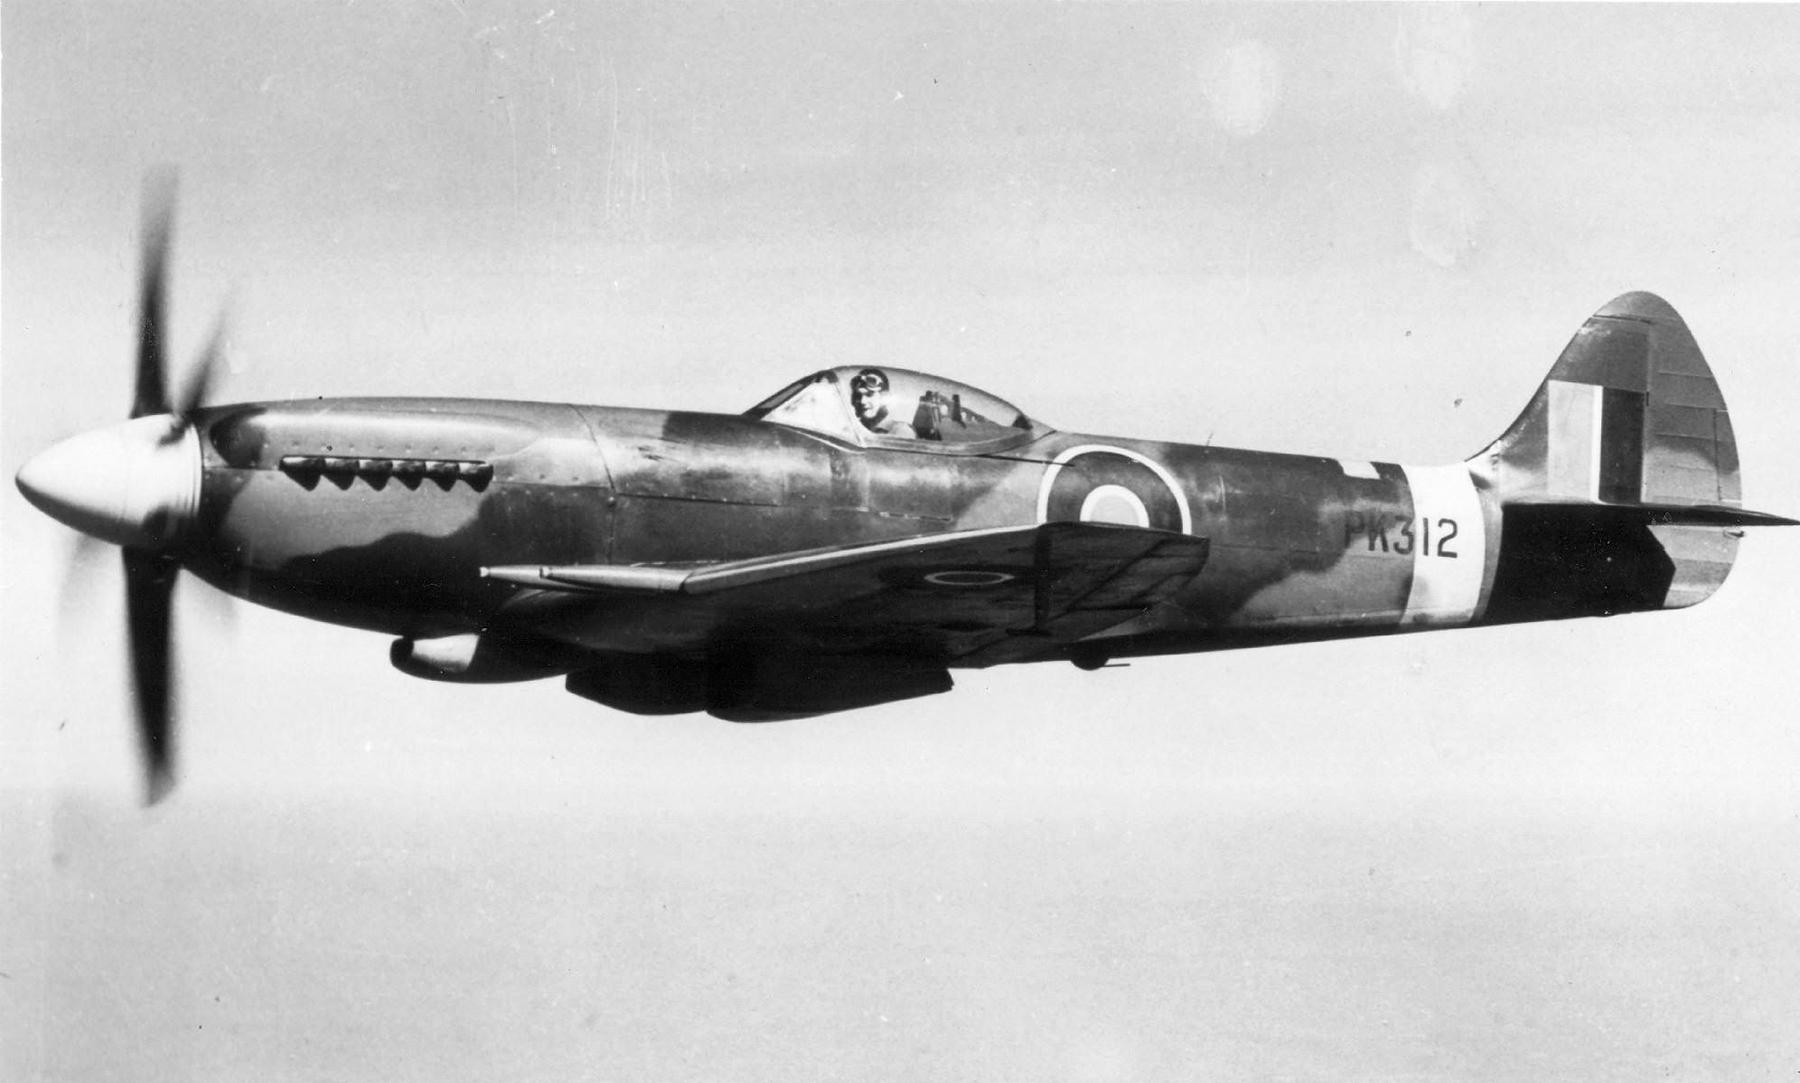 Spitfire 22 Prototype PK312 over England Mar 1945 web 01